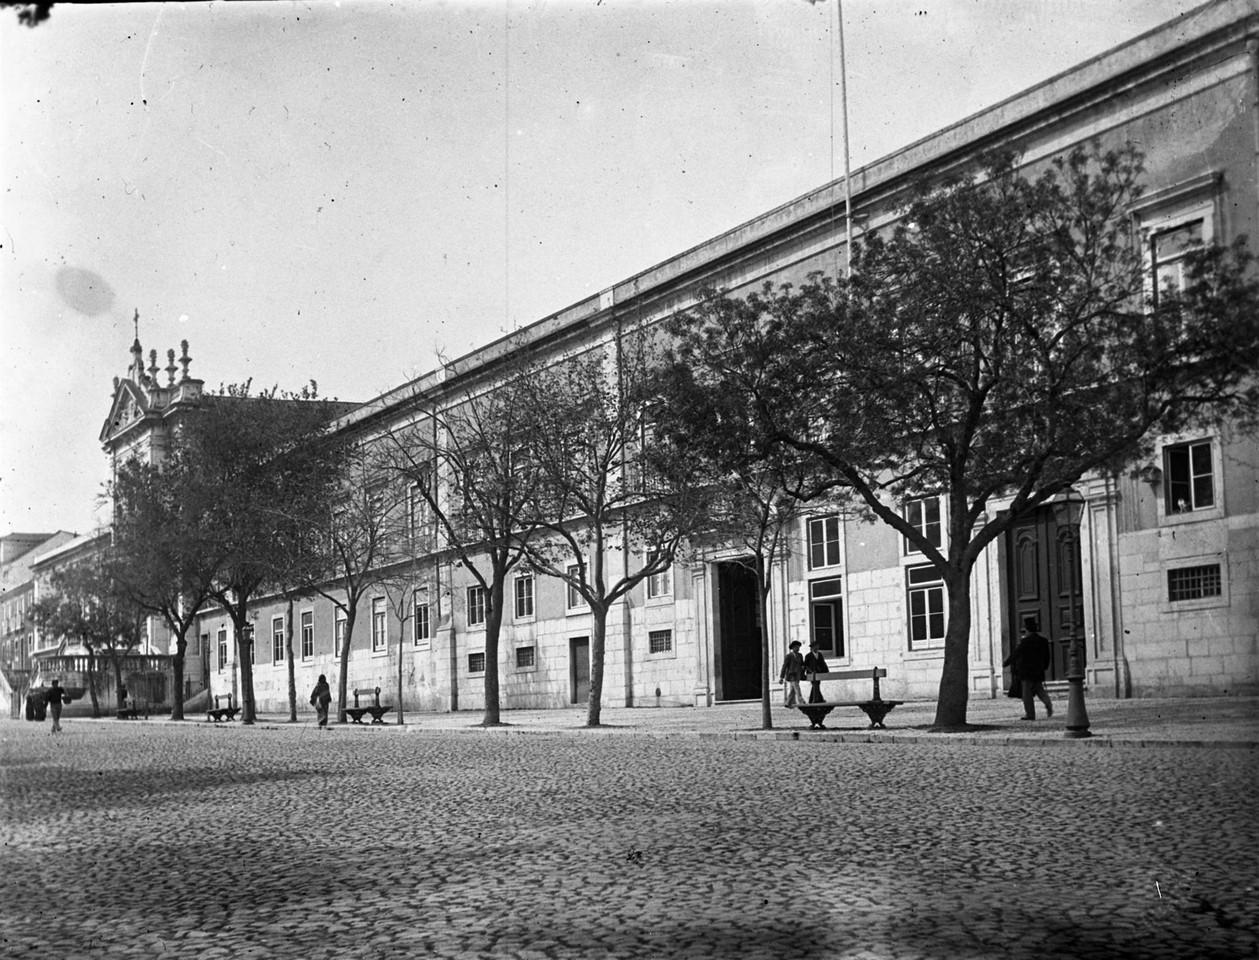 Palácio da Bemposta, fotógrafo n i.jpg